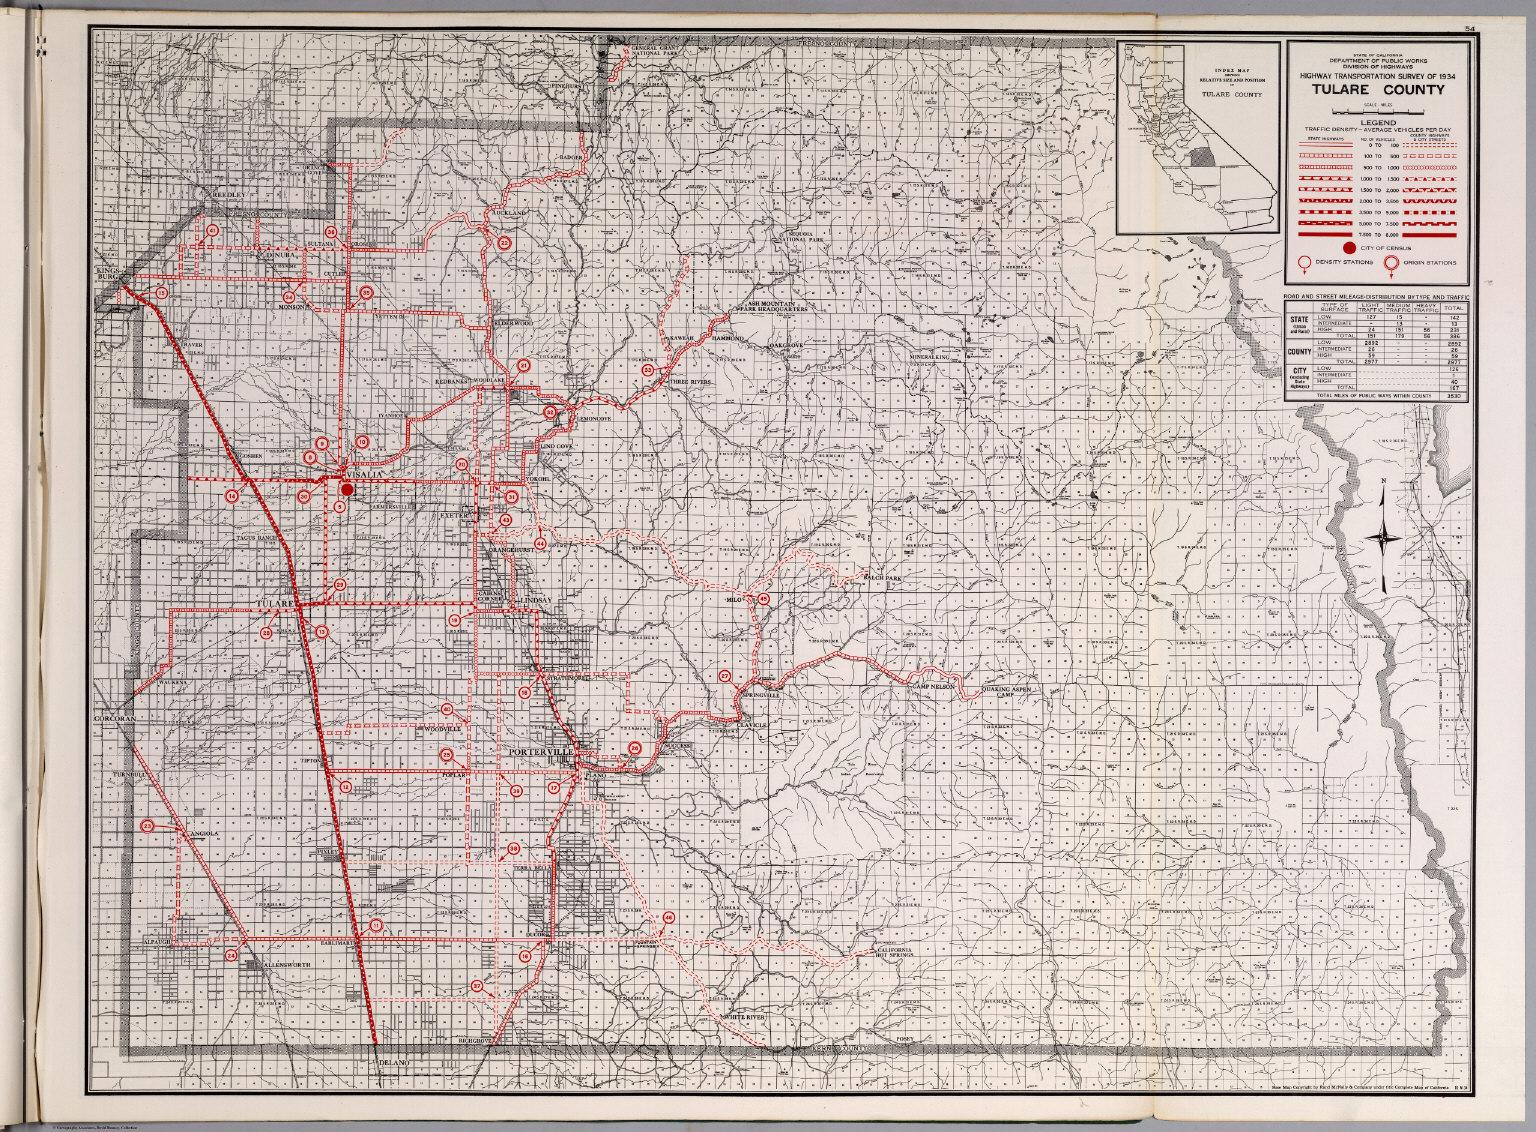 Tulare County.